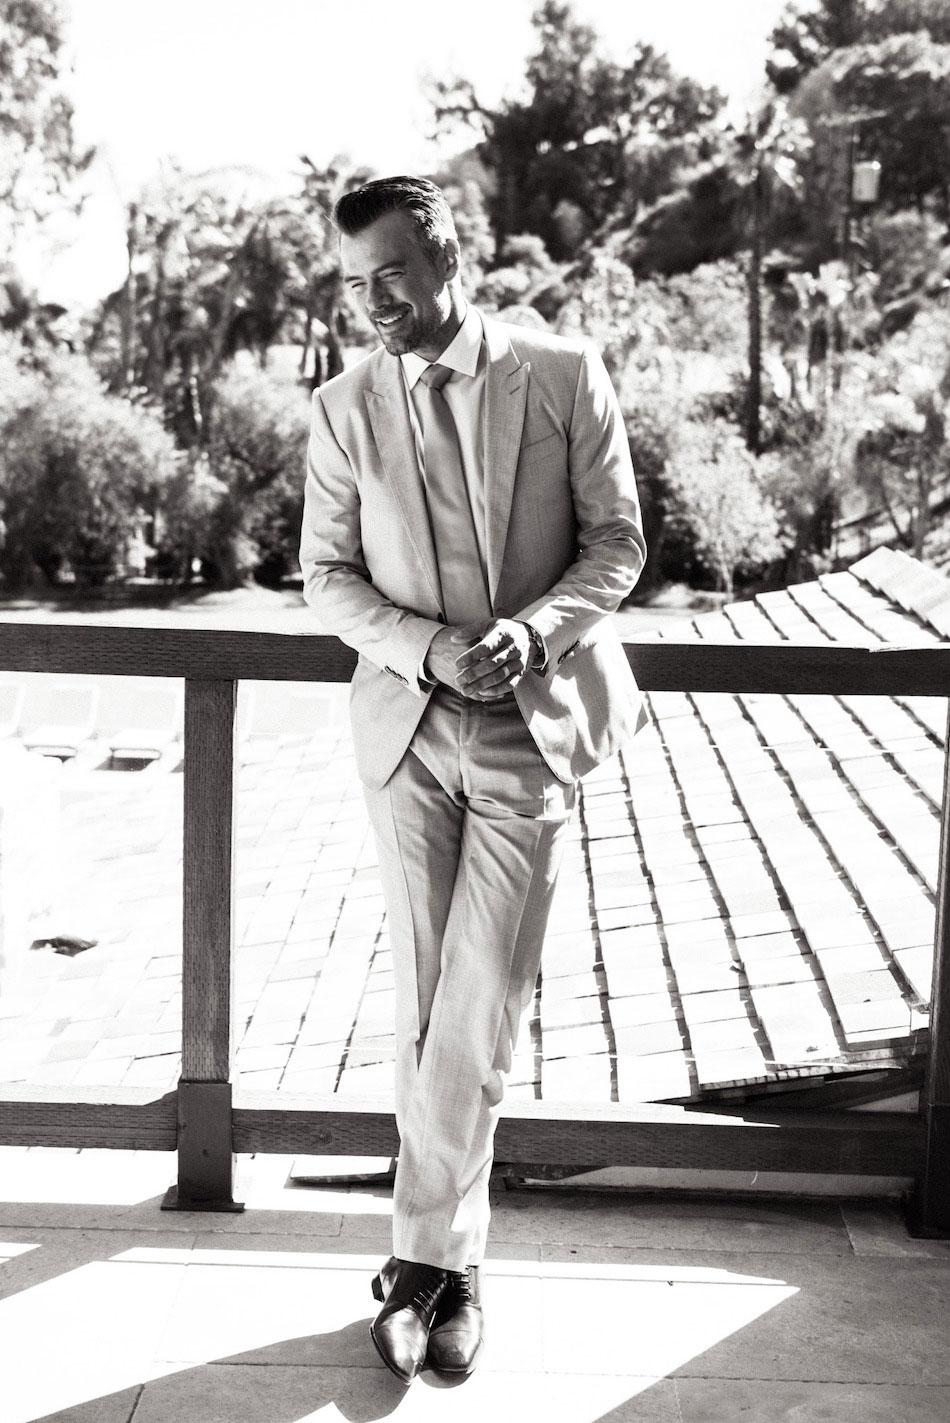 Duhamel looks dapper in a Dolce & Gabbana suit and tie, a John Varvatos button-up shirt, Louboutin dress shoes and a Panerai watch.